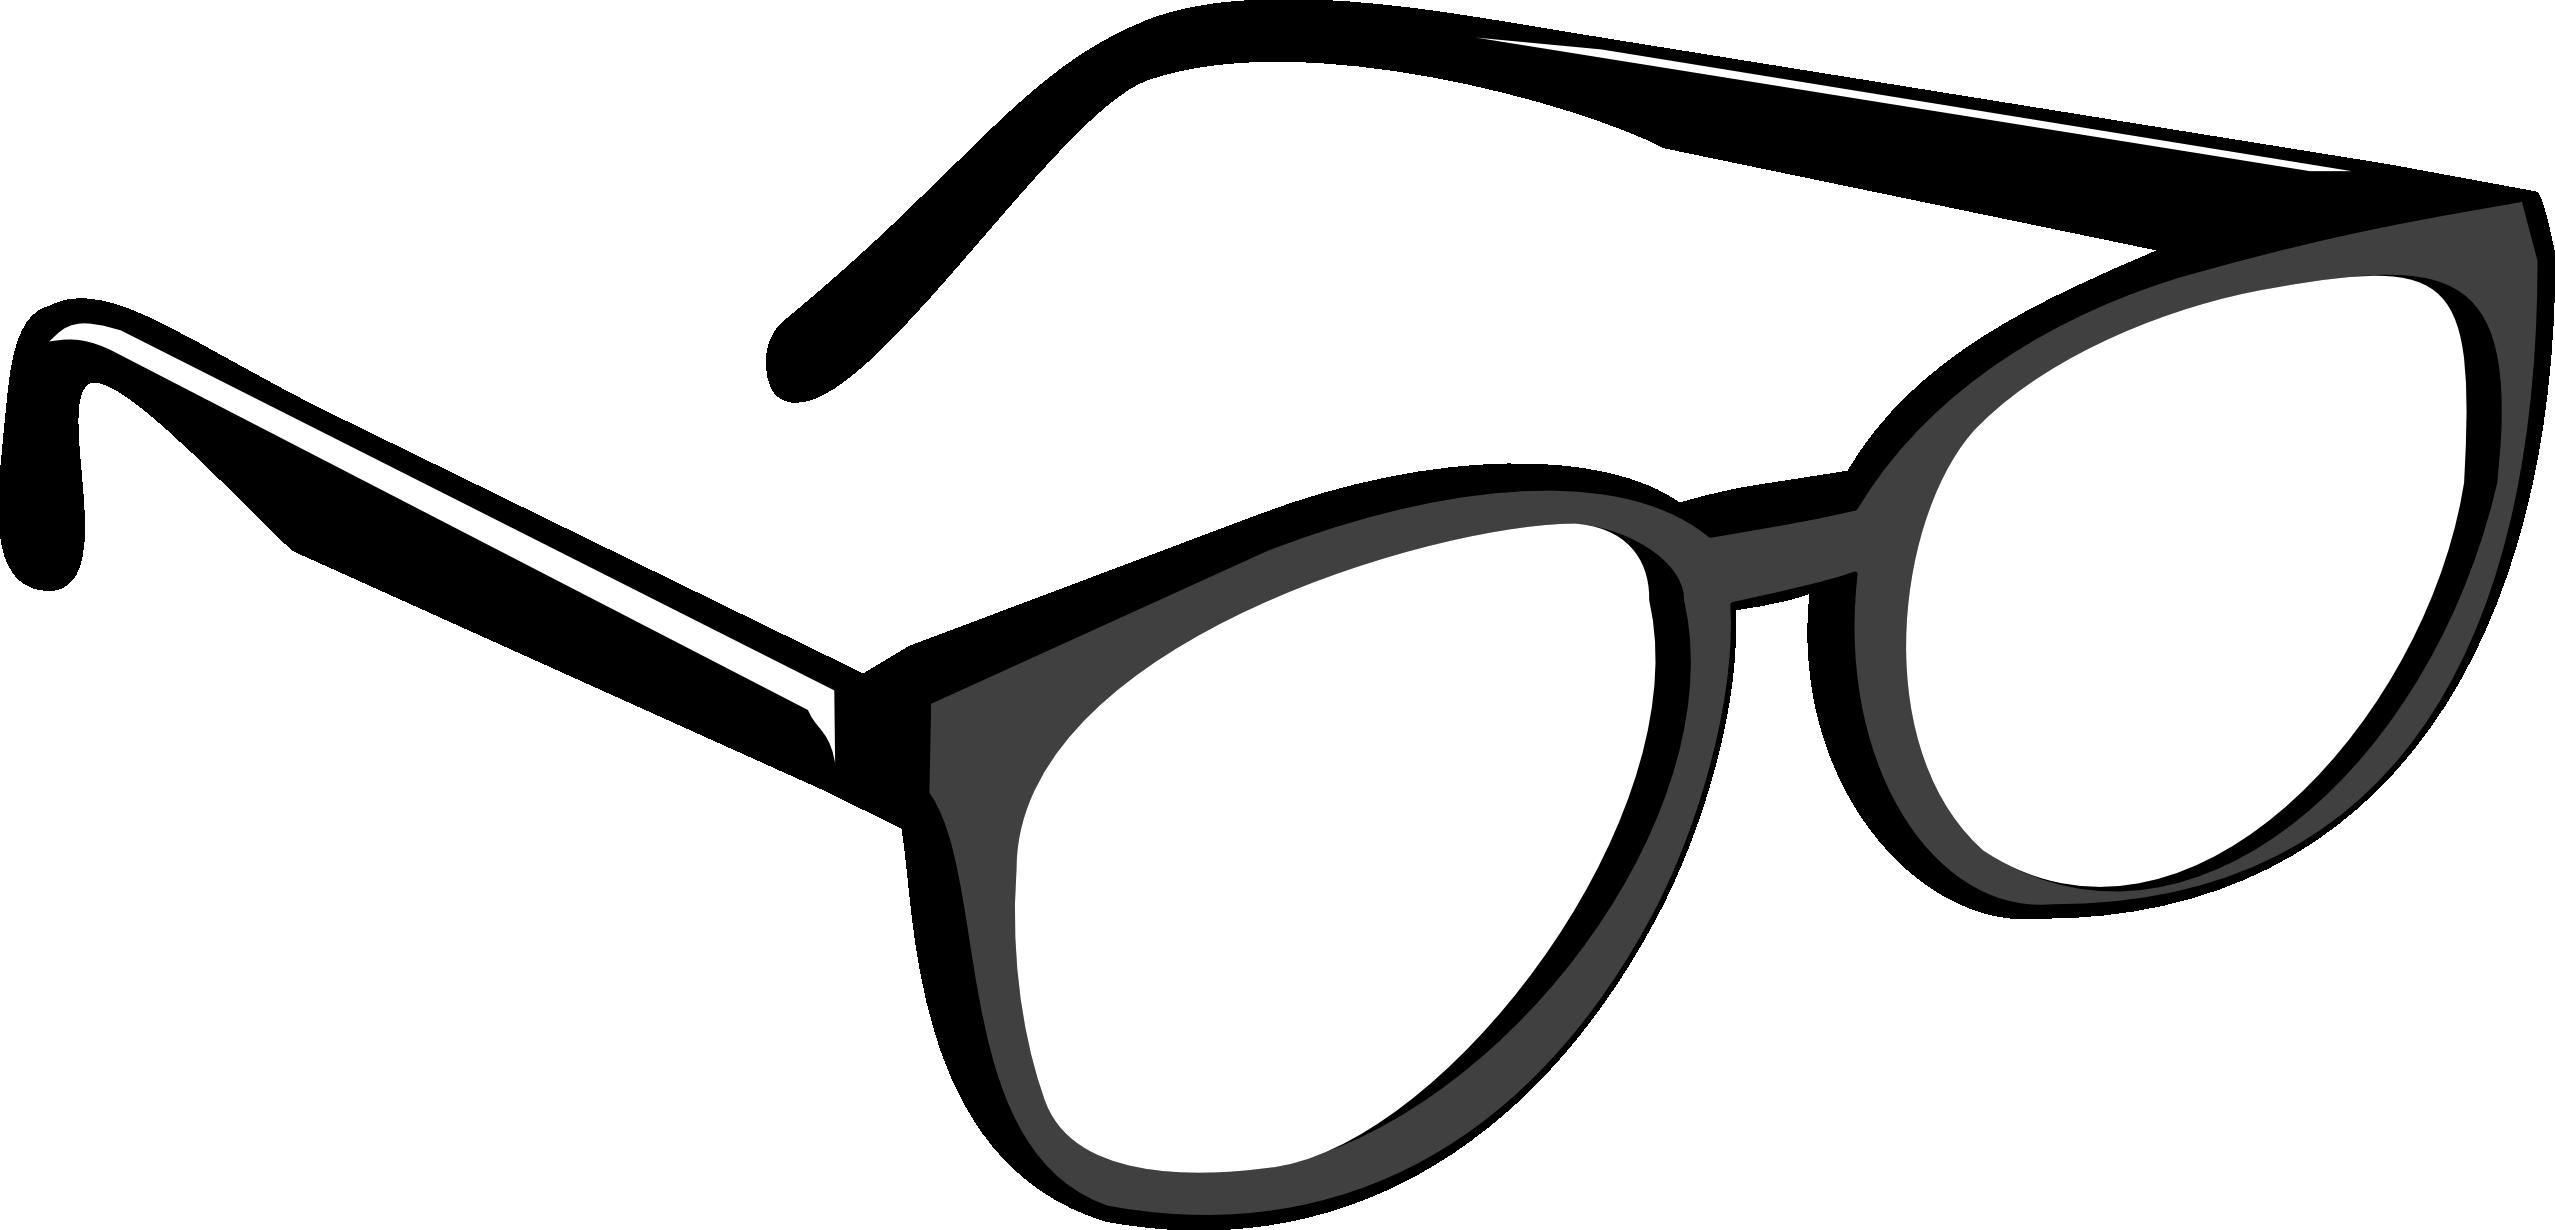 Glasses clipart baby. Cliparts co arta project